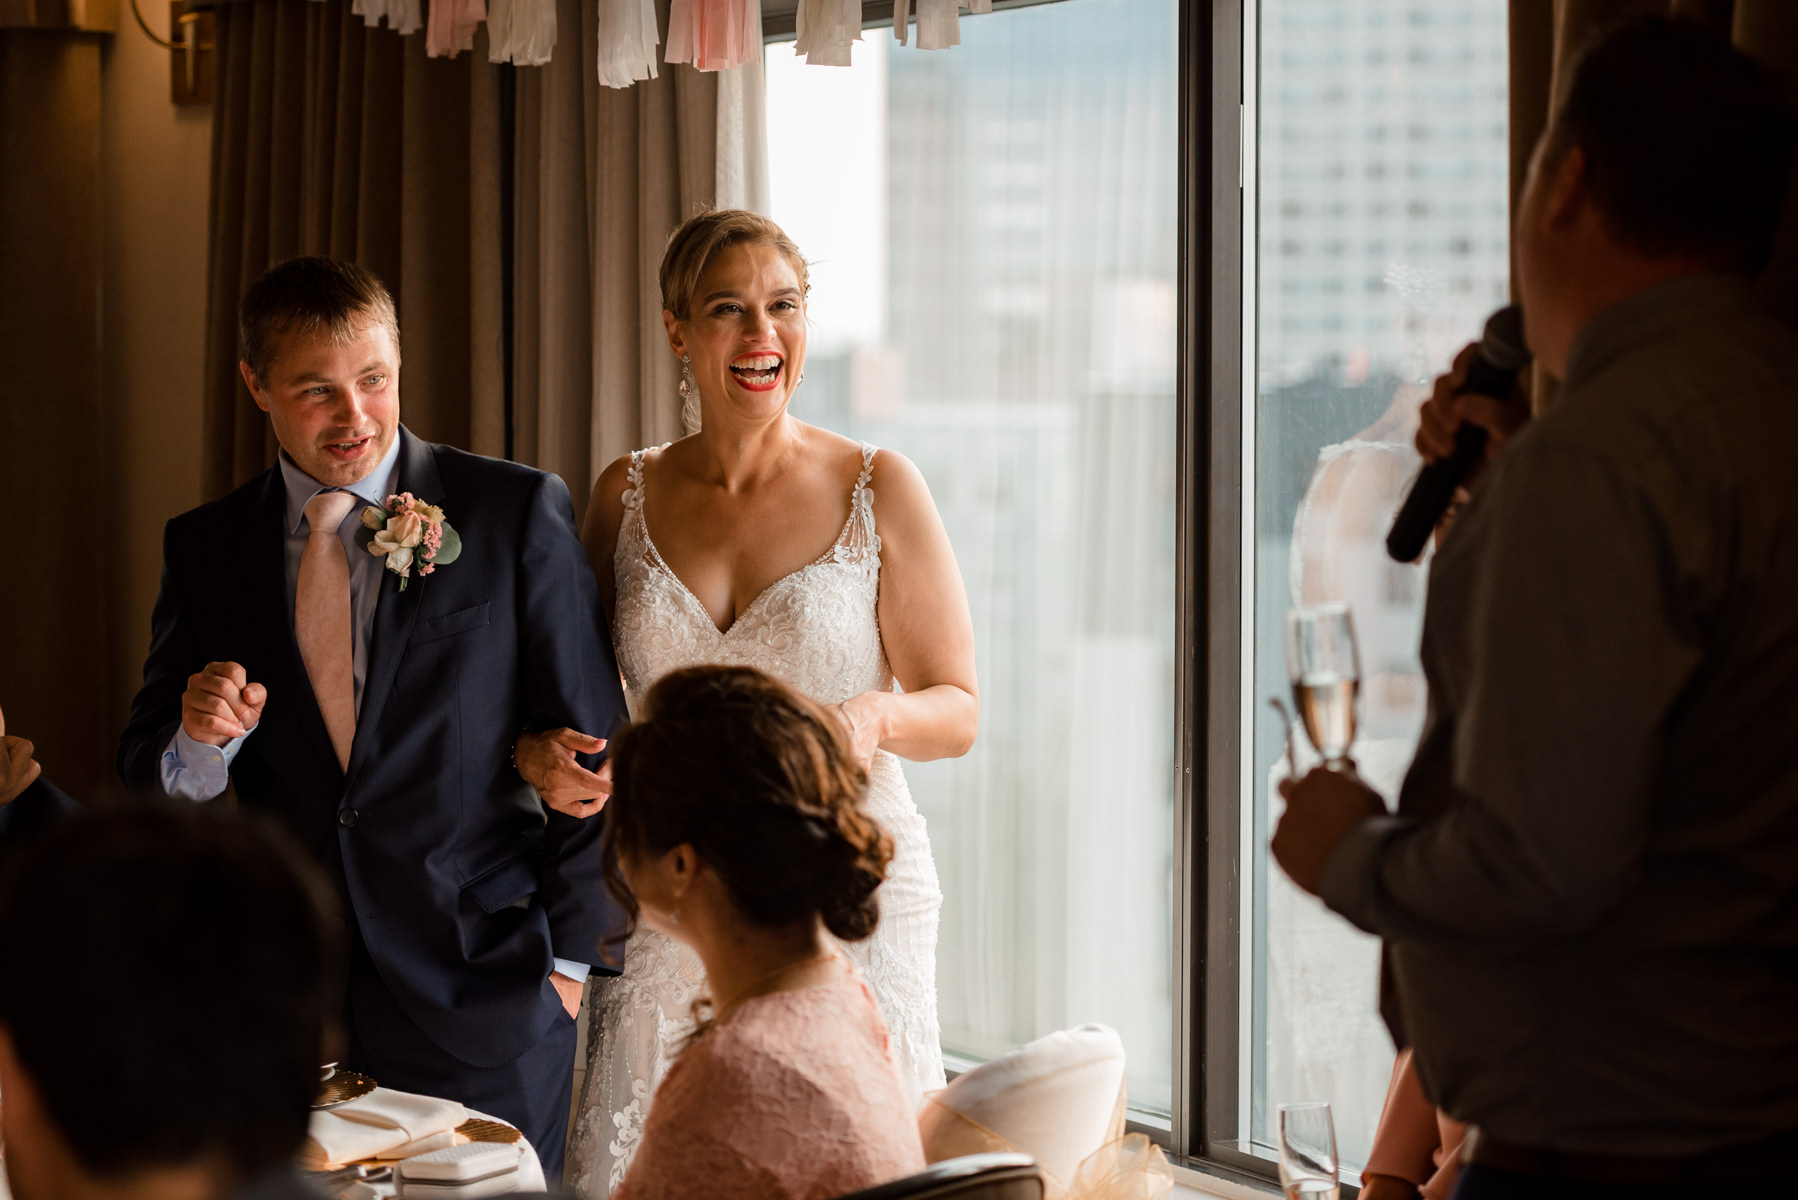 Andrew Tat - Documentary Wedding Photography - Hotel Sorrento - Seattle, Washington -Jessica & Paul - 32.jpg